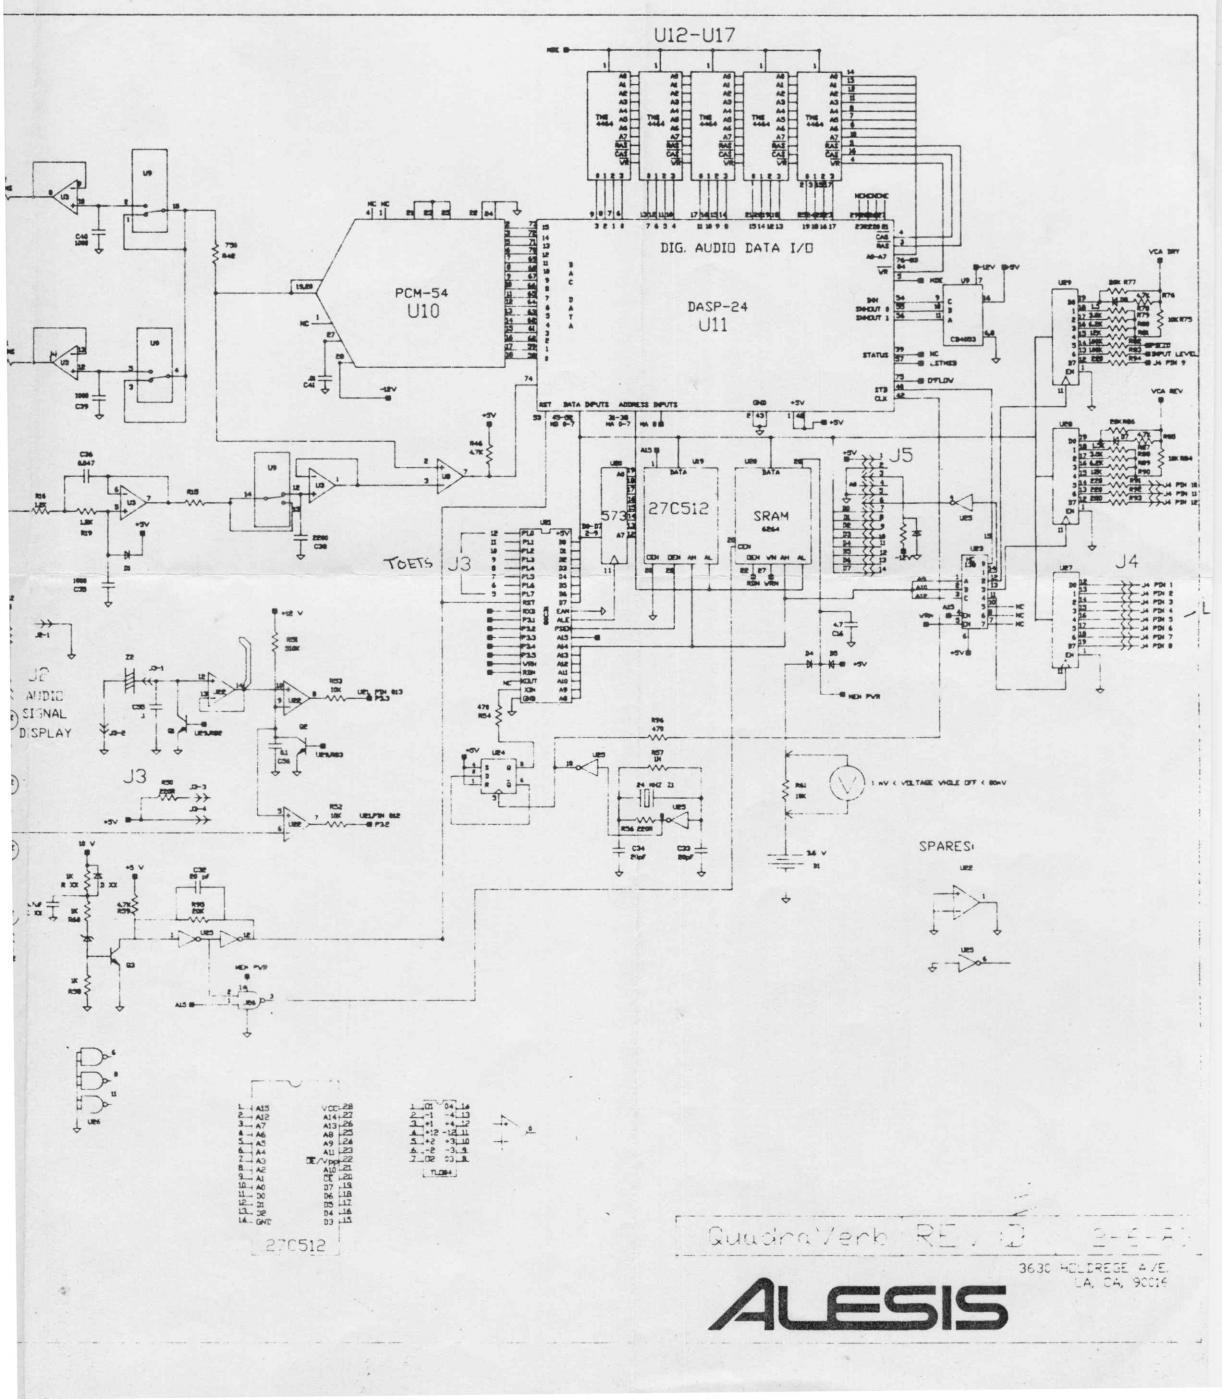 quadraverb 1 circuit board help